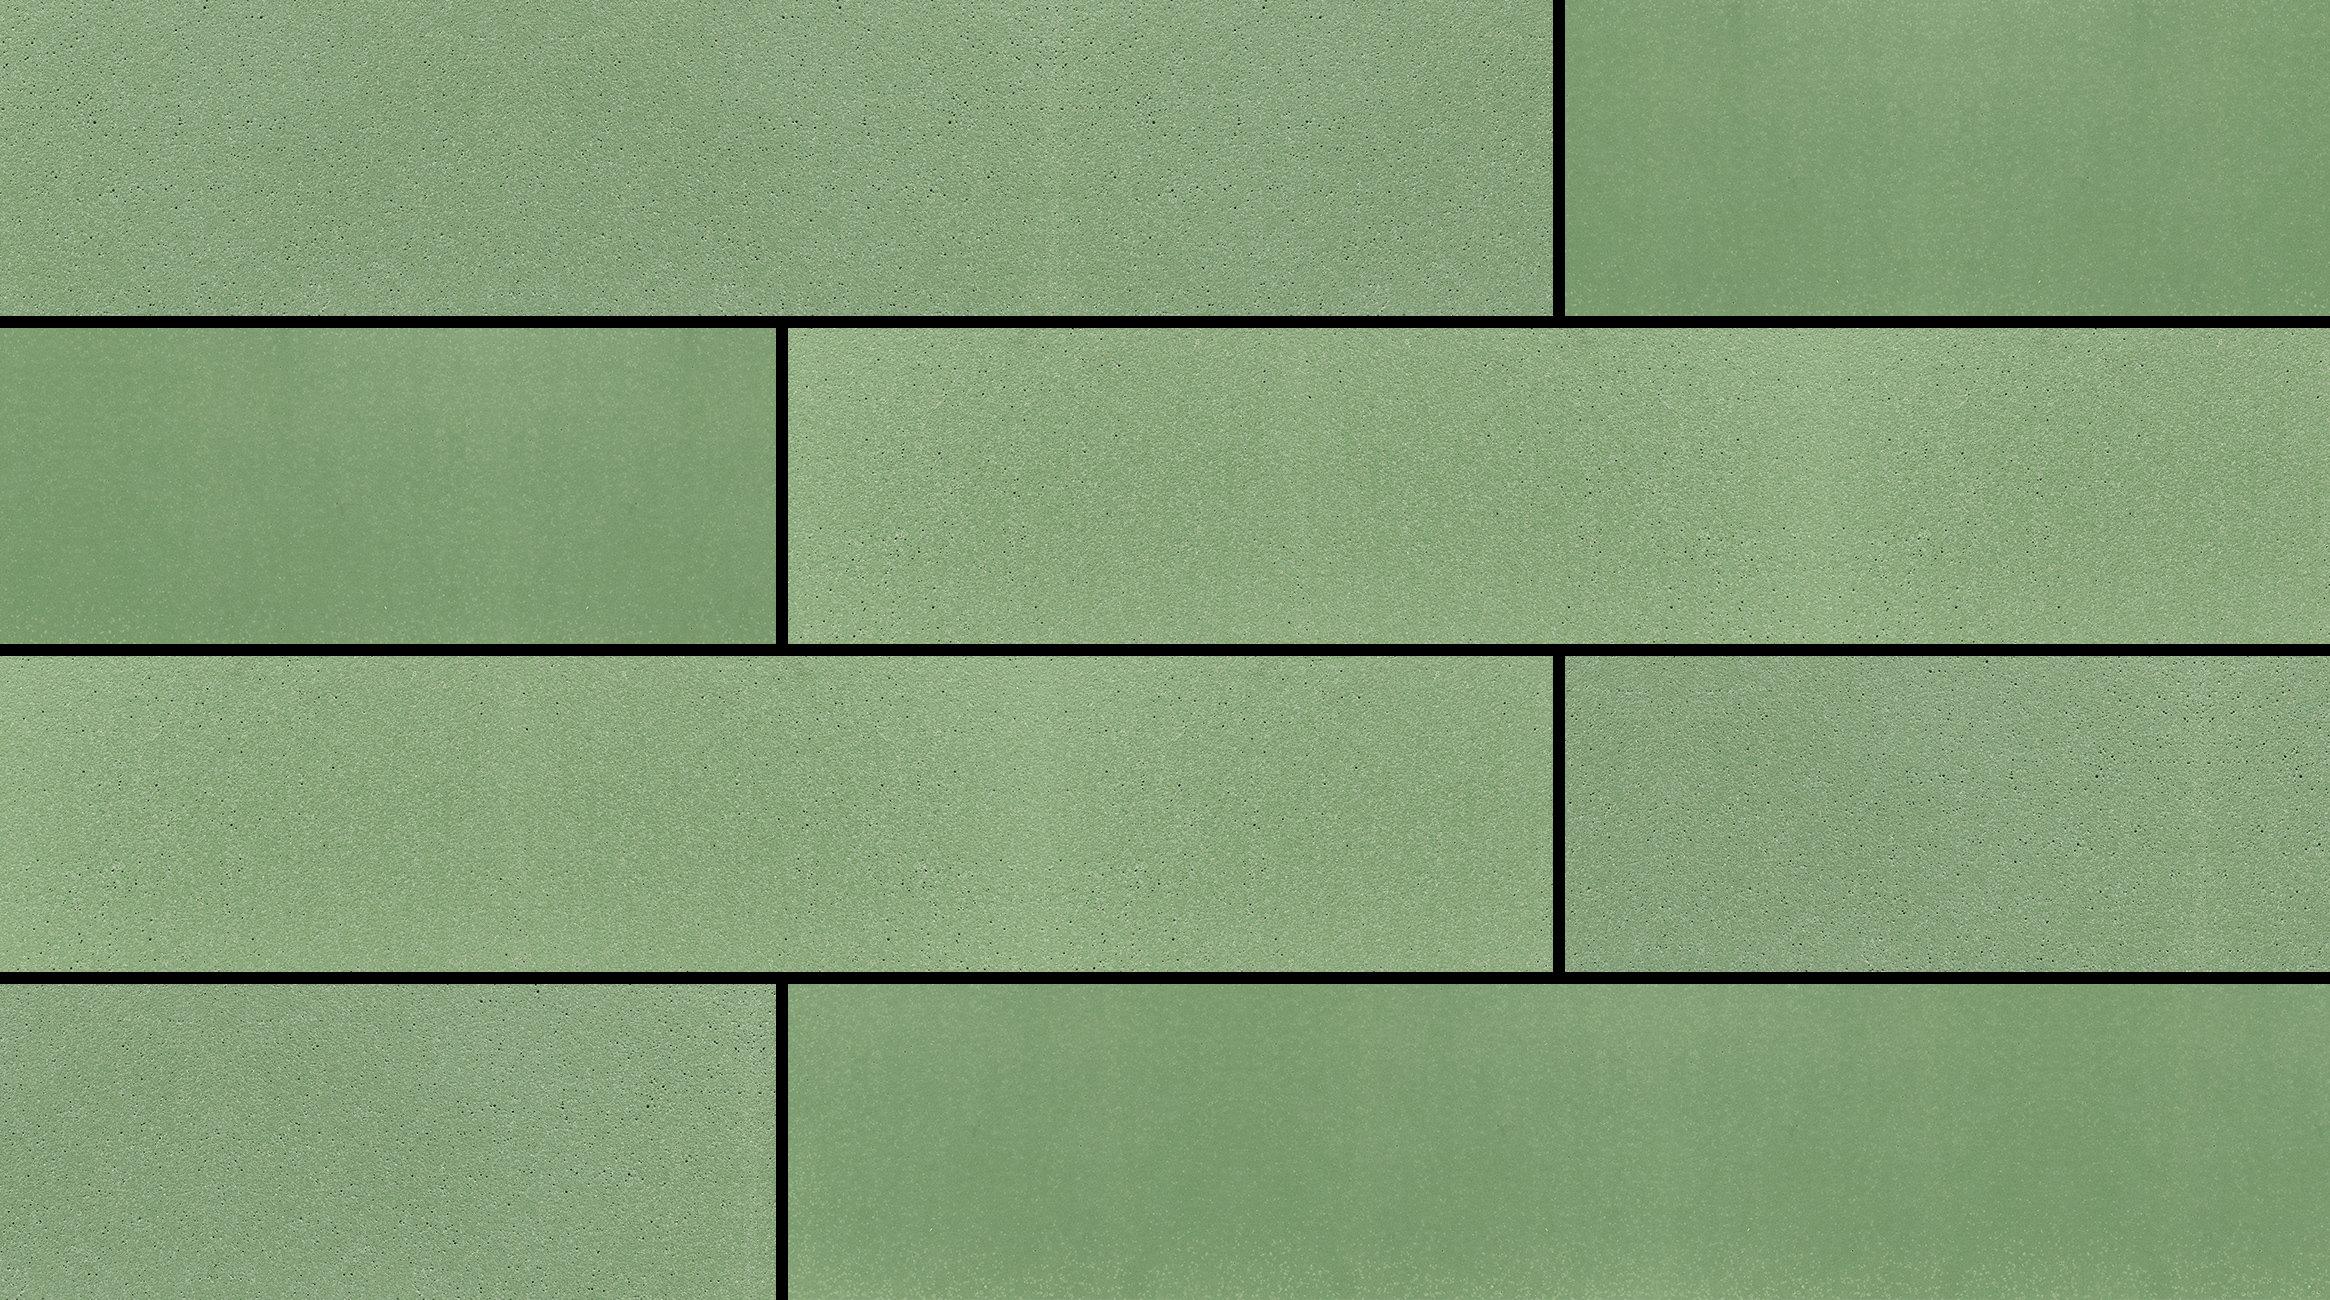 Innovative Gfrc Cladding Slats Amp Panels By Rieder Facades